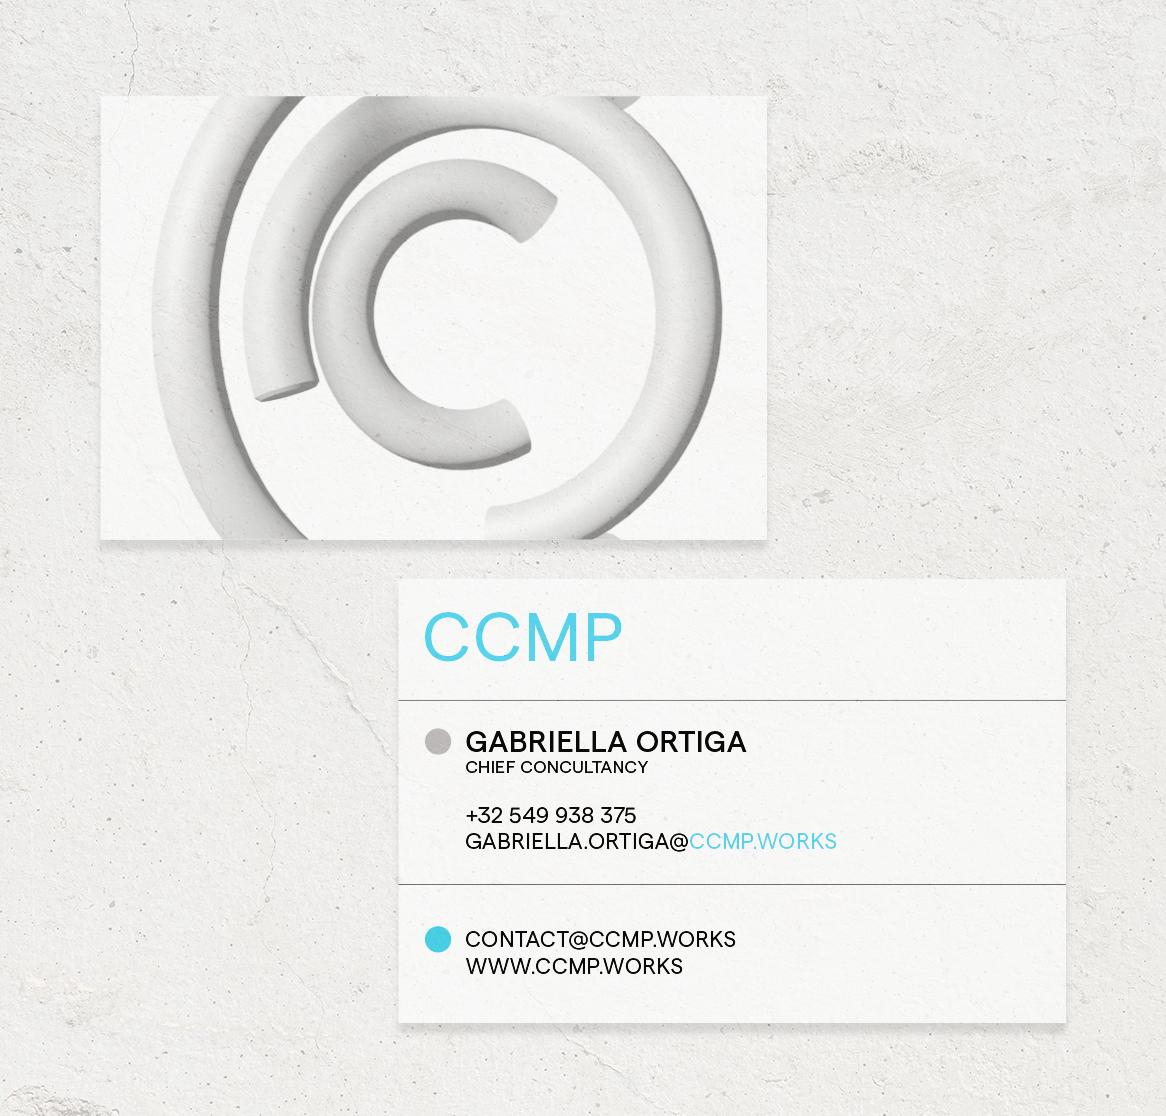 ccmp-bcards-mockup